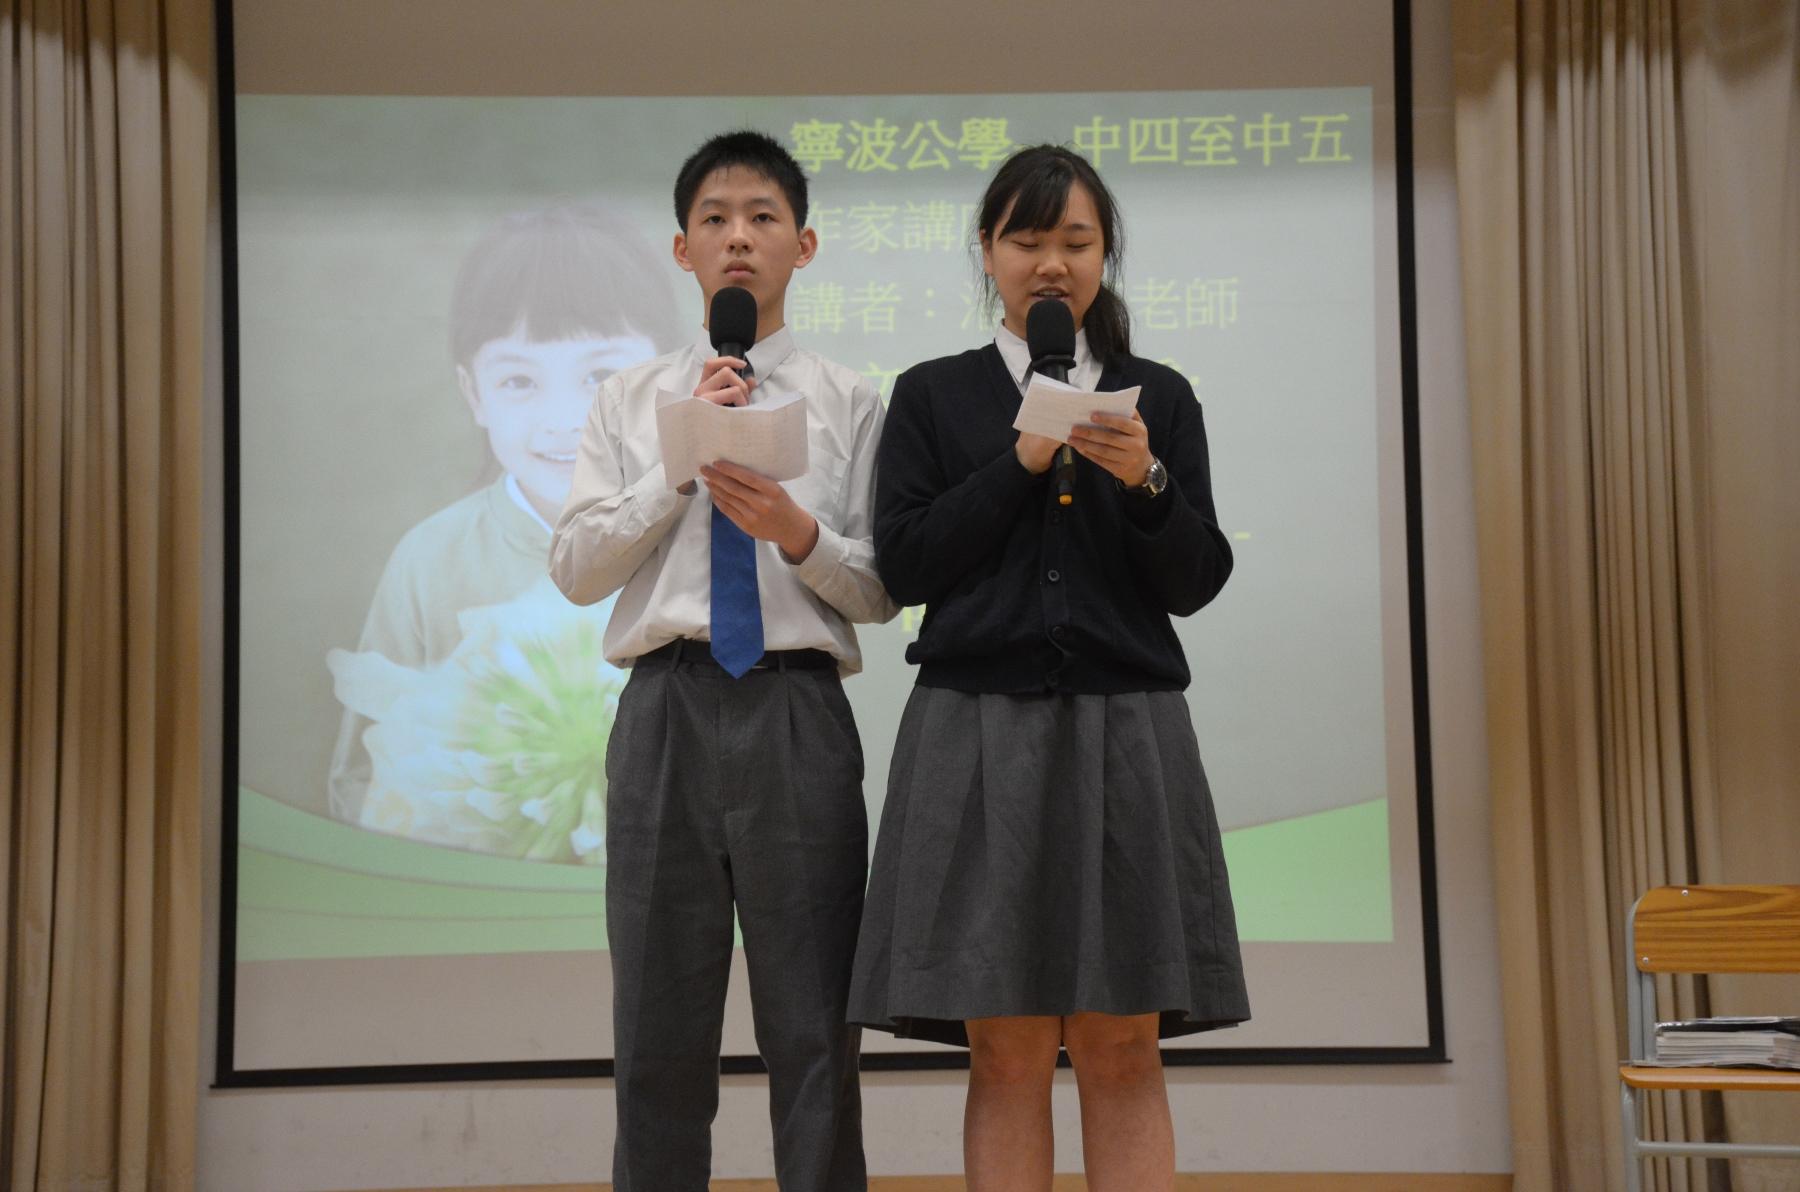 http://npc.edu.hk/sites/default/files/dsc_2440.jpg